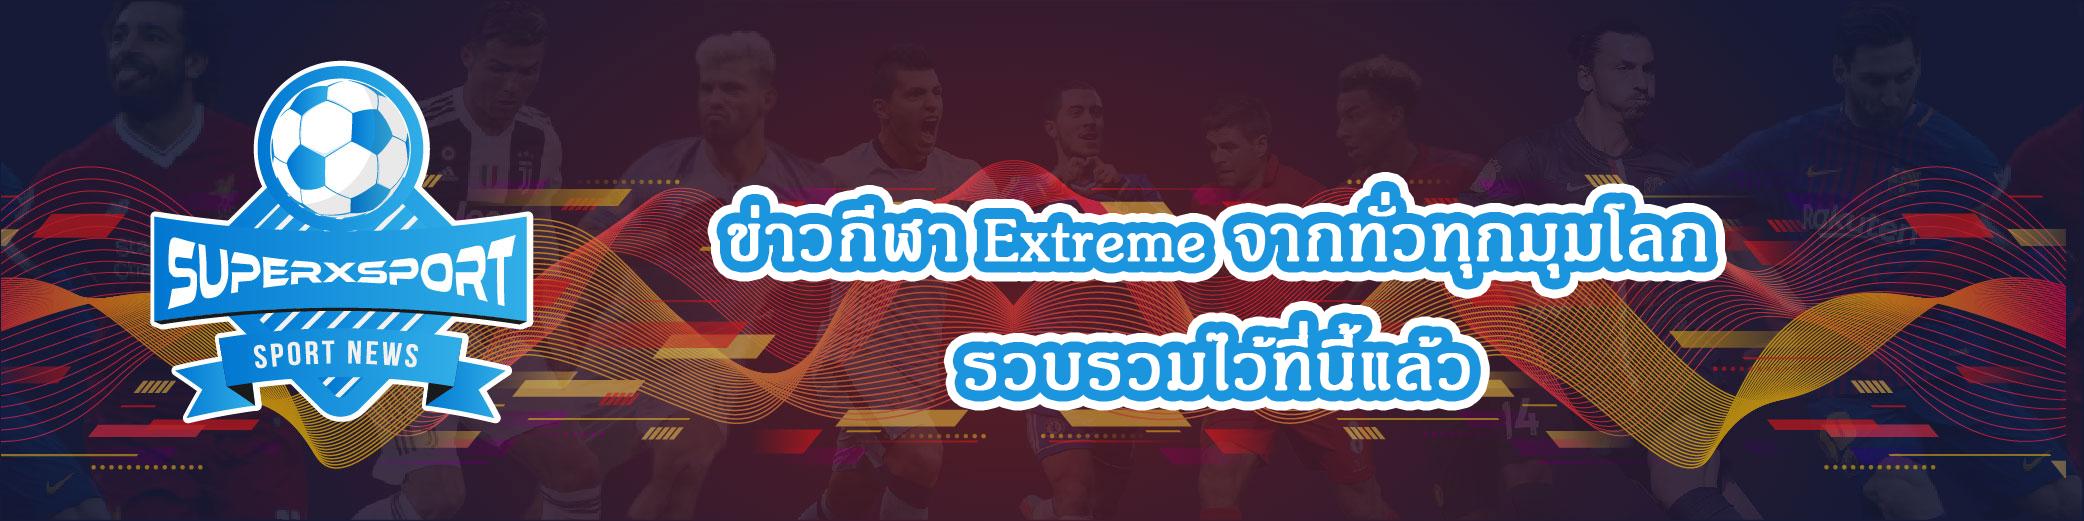 superXsport